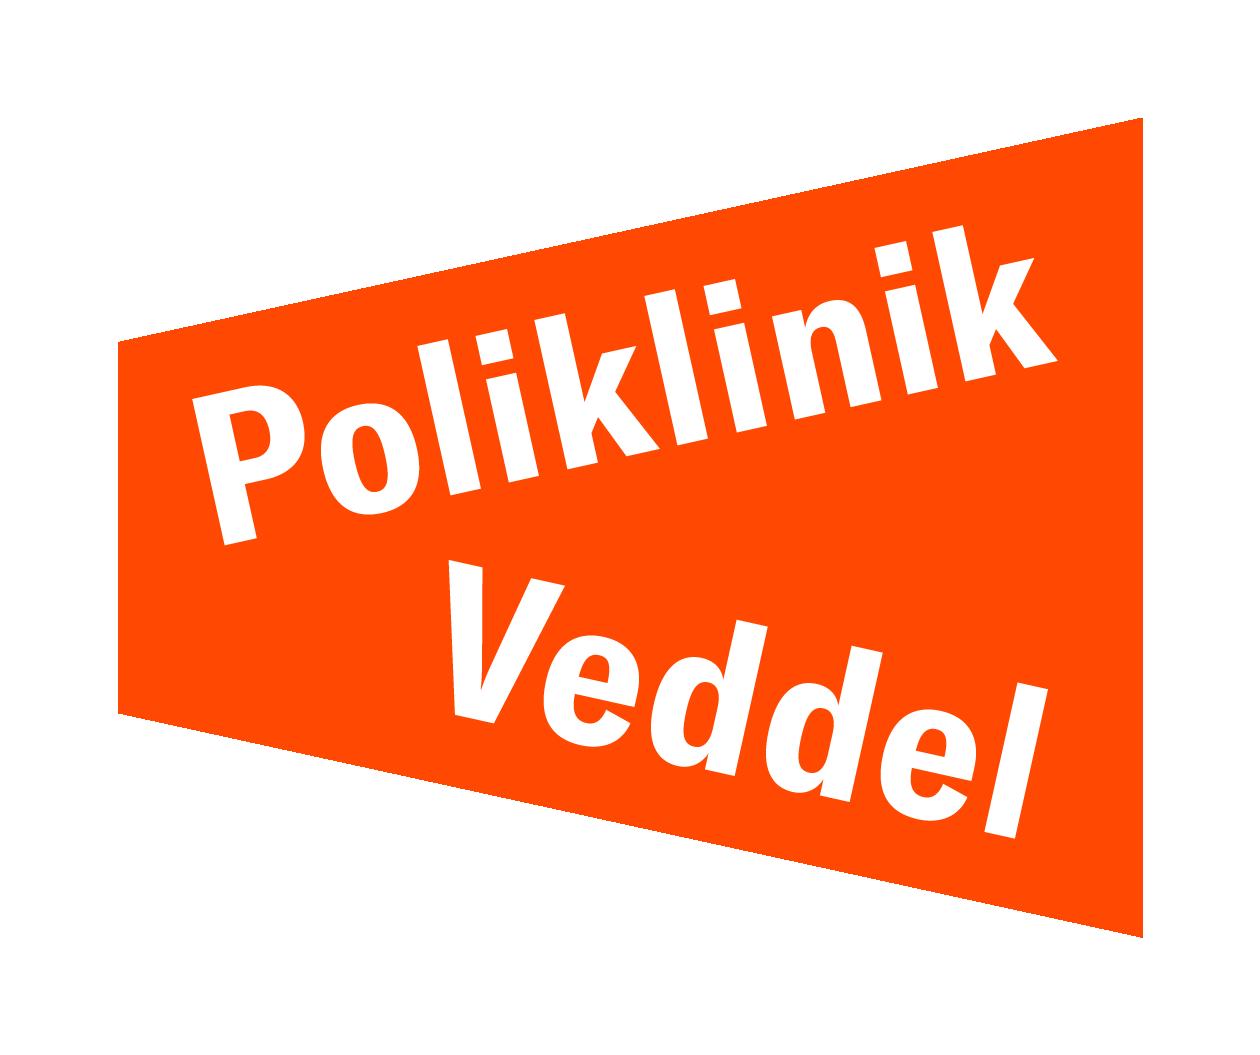 Poliklinik Logo